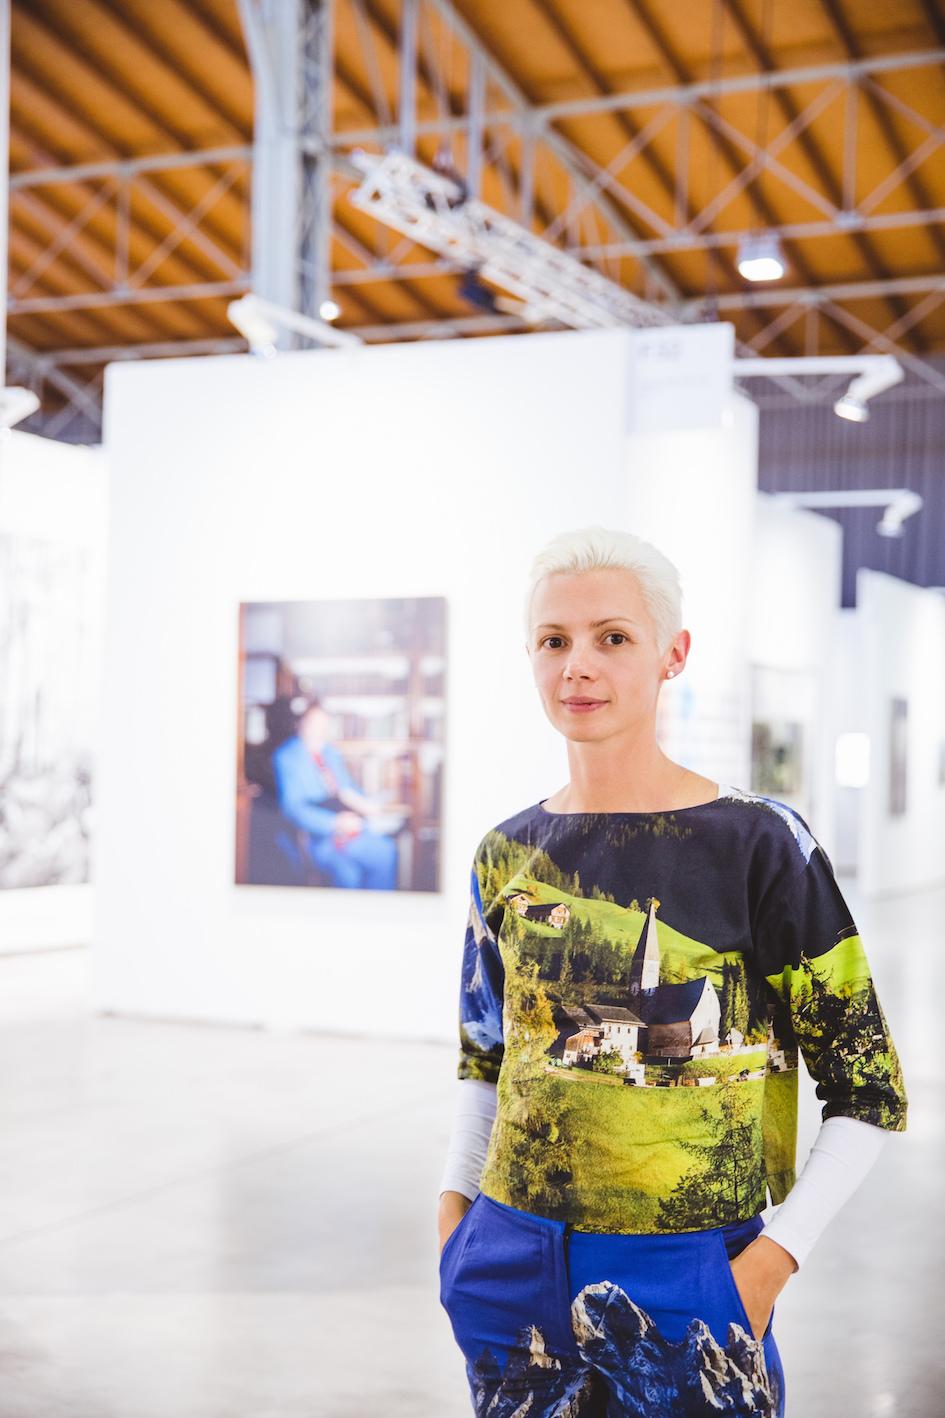 Christina Steibrecher Pfandt. Photo © A. Murahskin ⁄ viennacontemporary